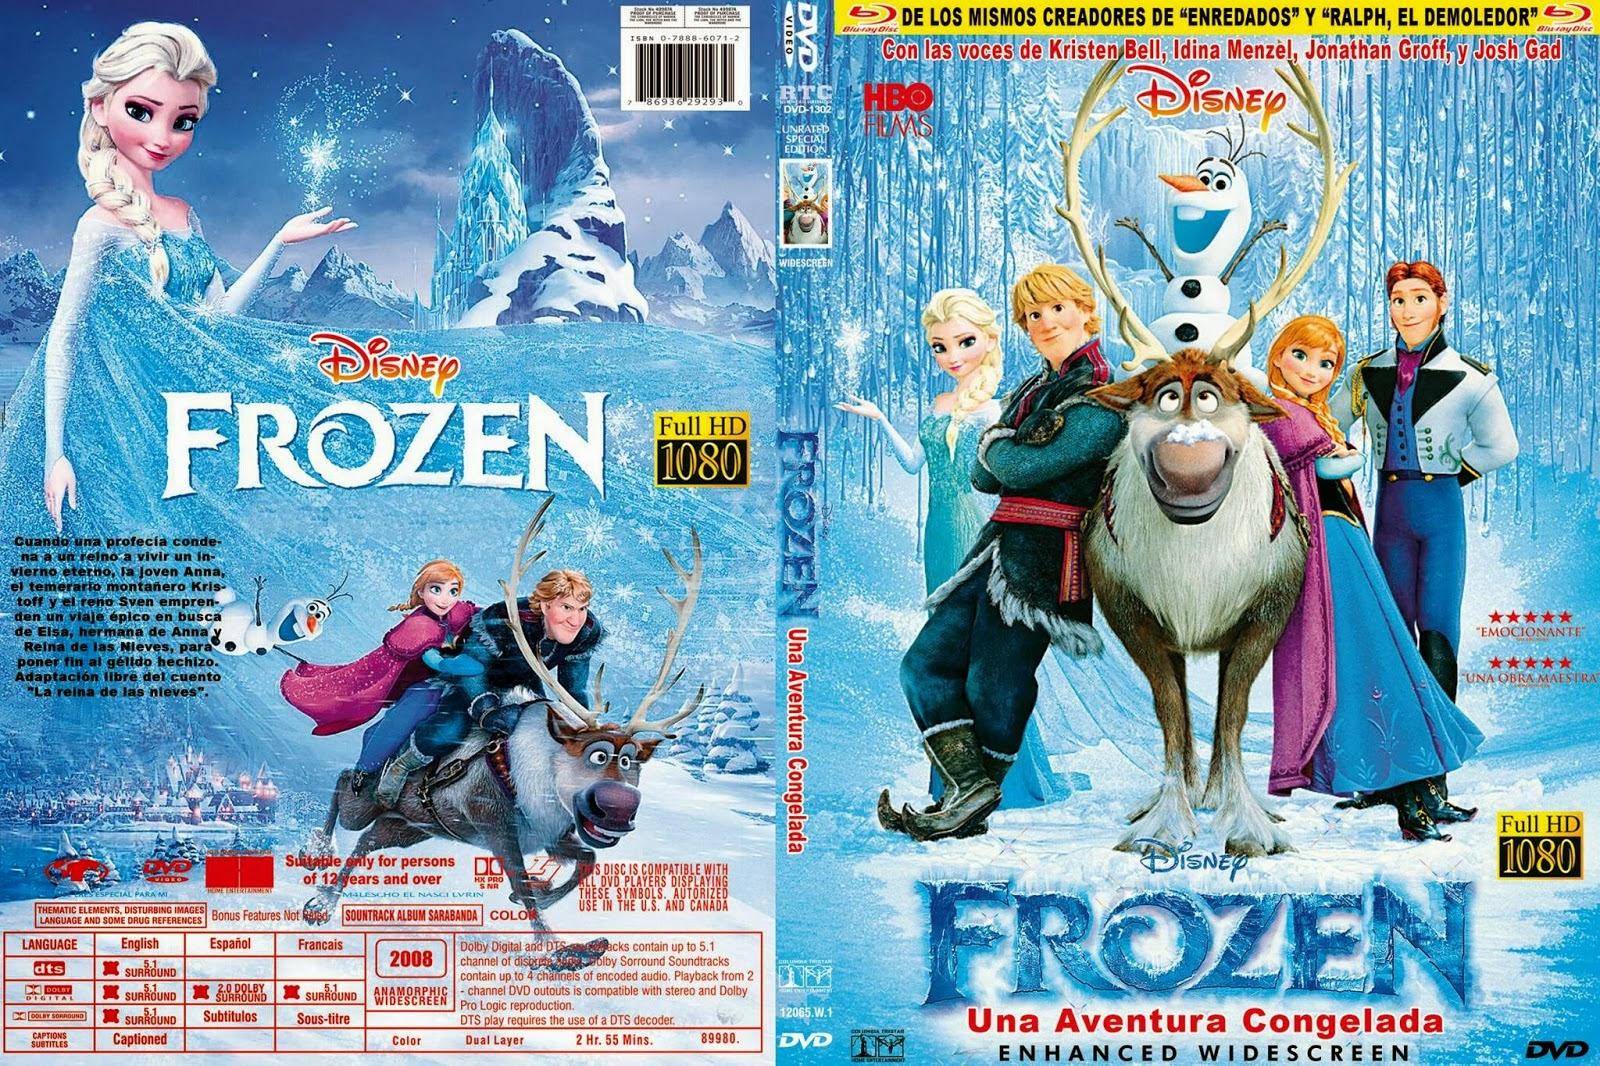 Frozen dvd 2013